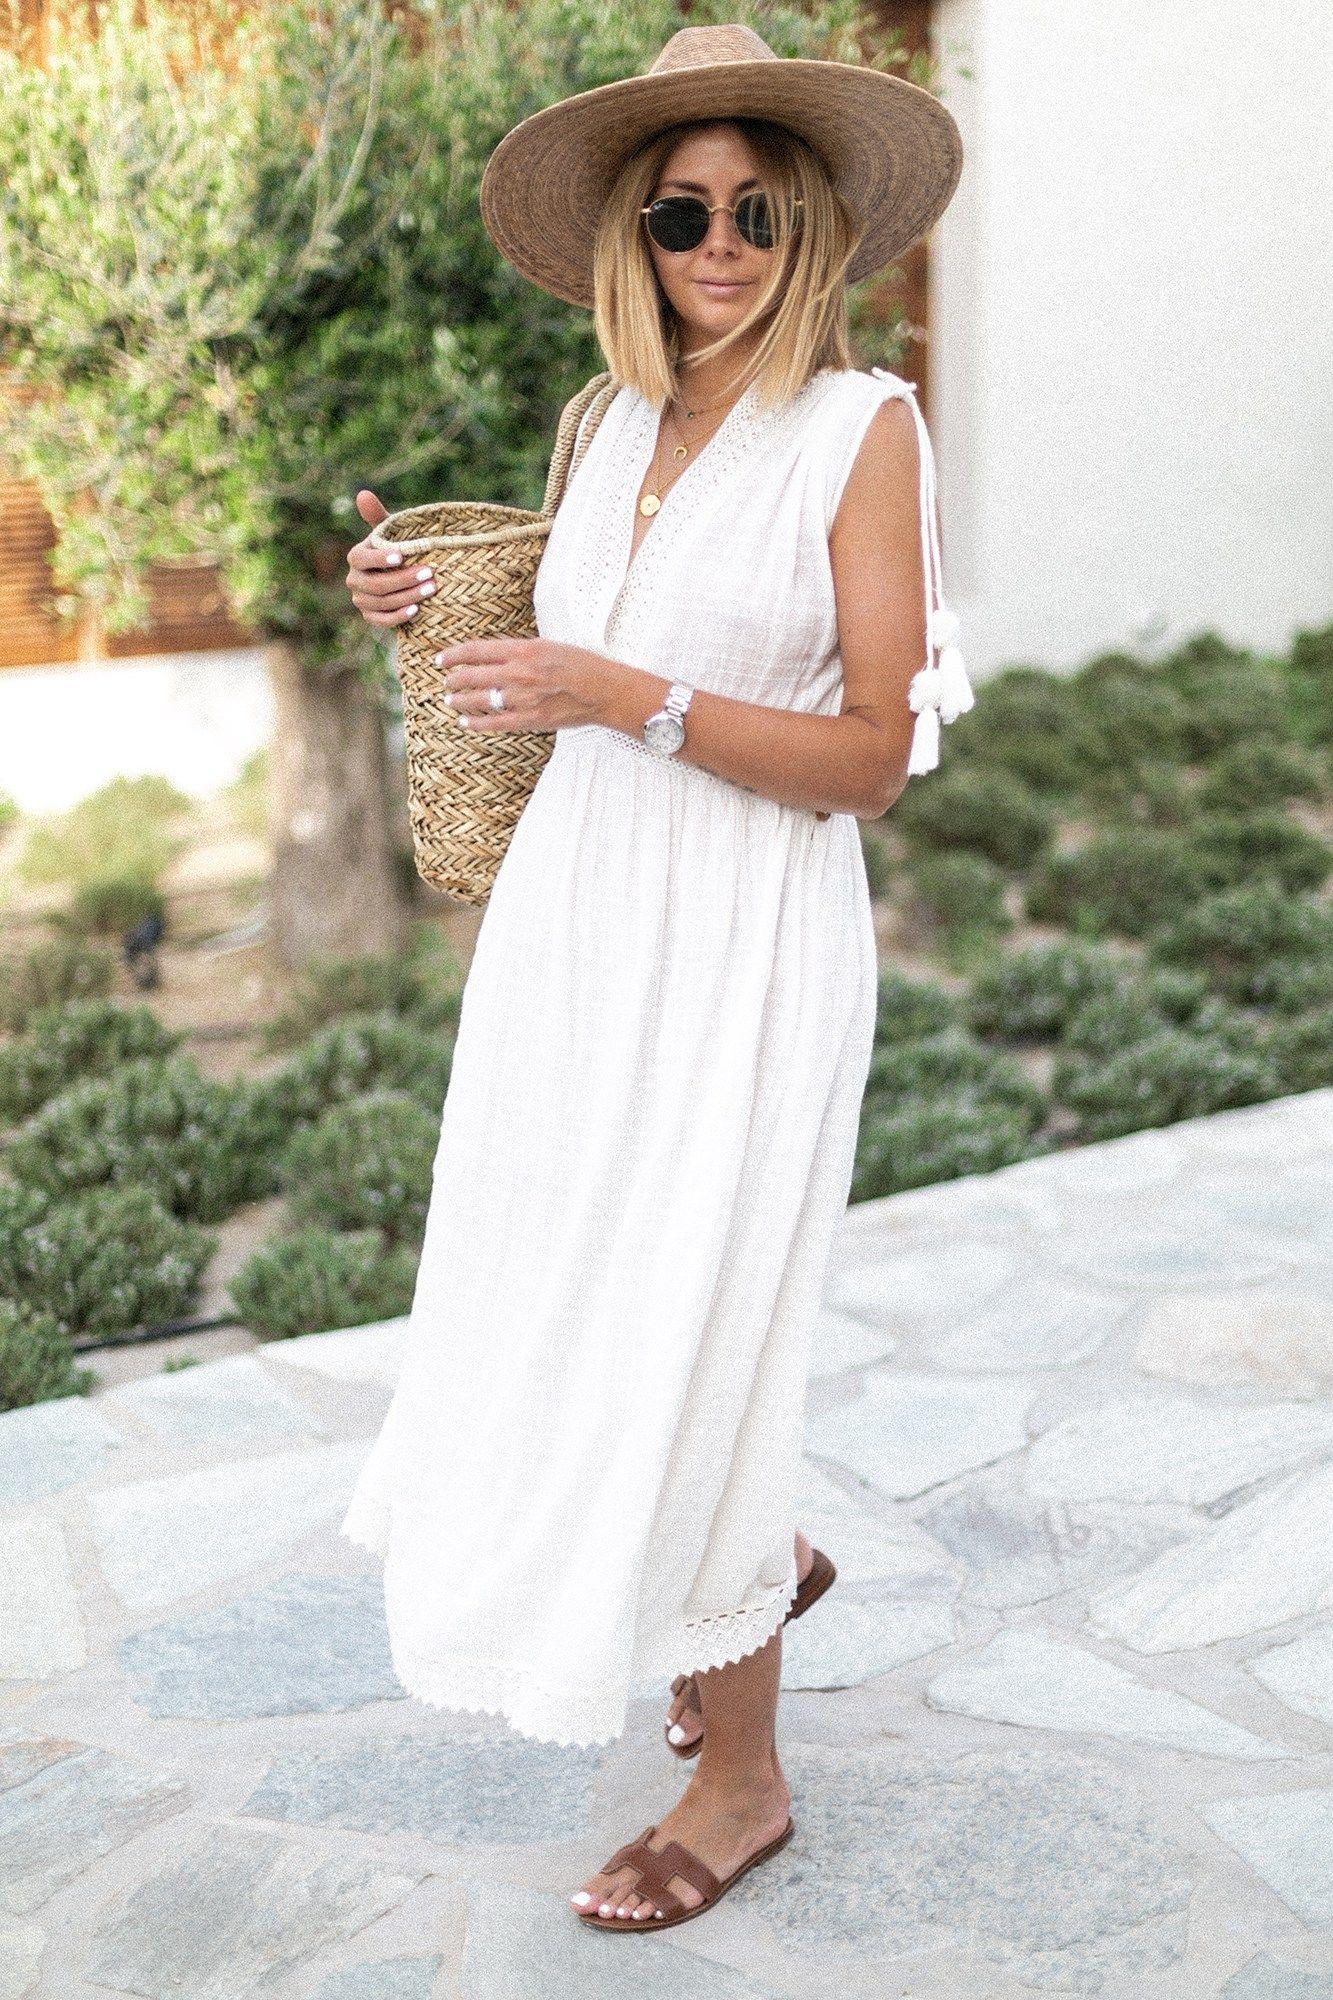 Emma Hill Wears White Summer Midi Dress Straw Fedora Wide Brim Hat Basket Bag Hermes Oran Sandals Round R White Summer Midi Dress Midi Dress Summer Fashion [ 2000 x 1333 Pixel ]